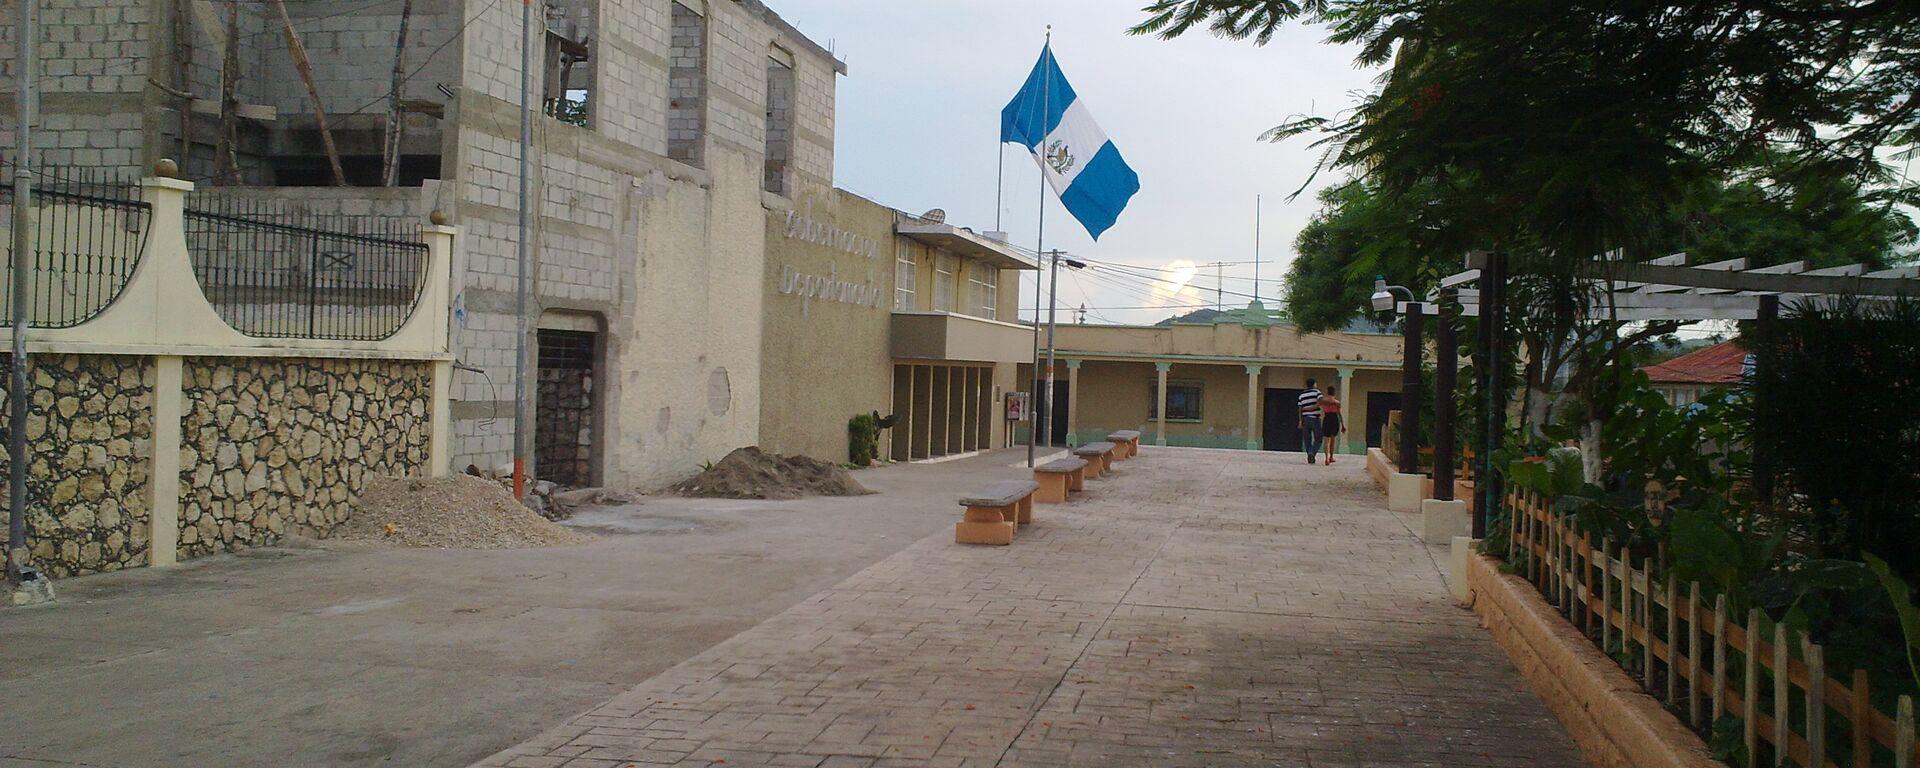 Una calle con la bandera de Guatemala - Sputnik Mundo, 1920, 30.07.2021